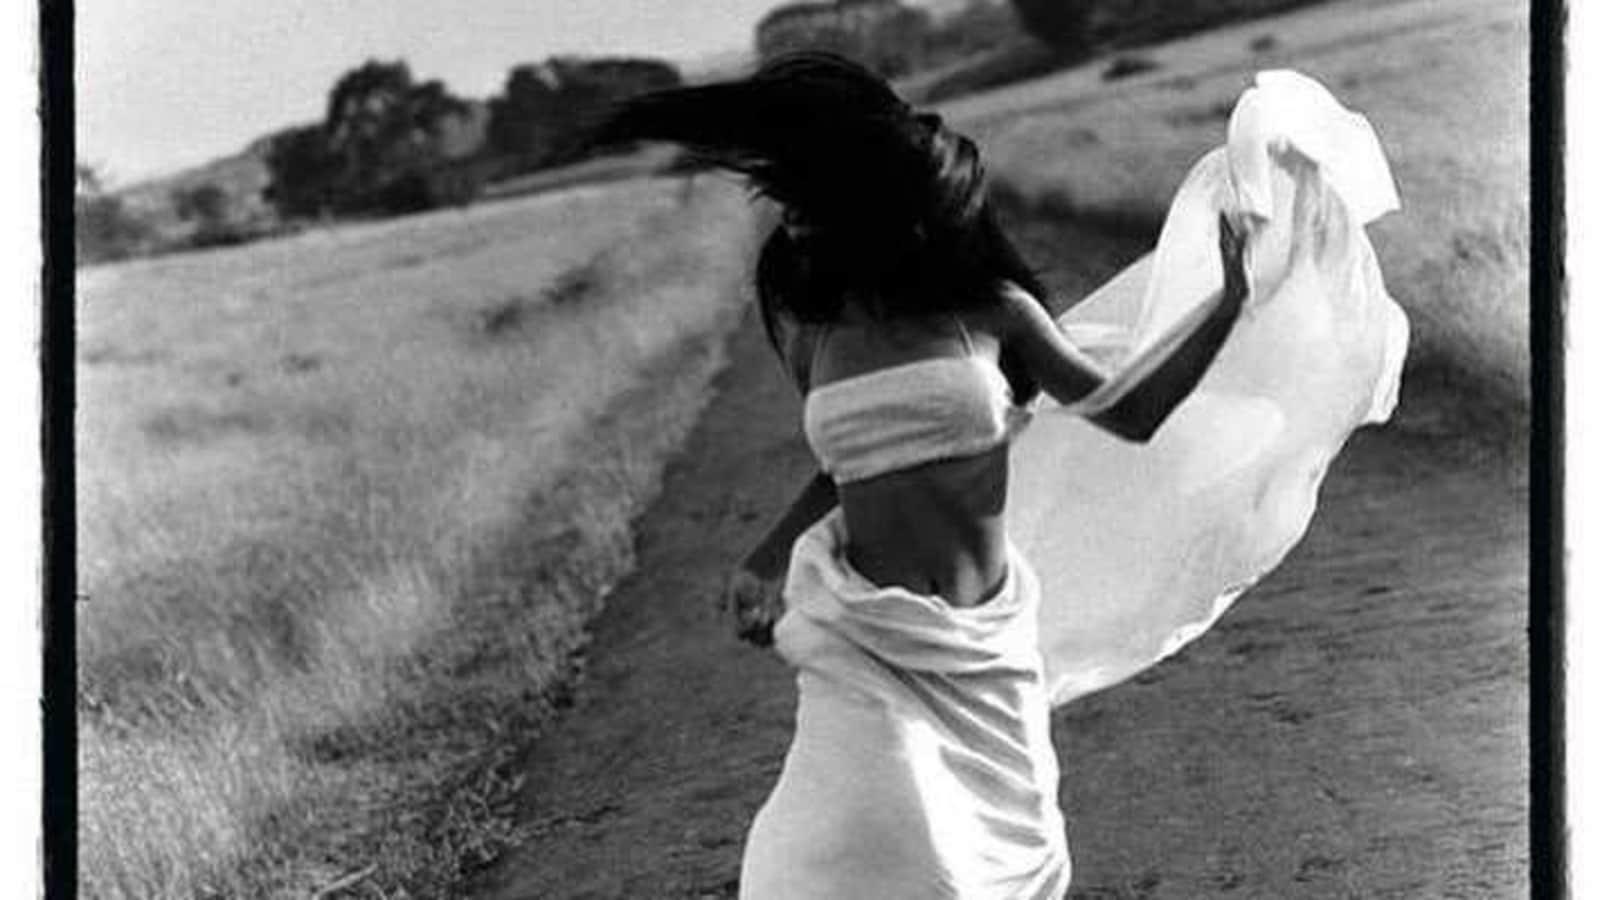 Malaika Arora gives Run Lola Run twist to old shoot, Katrina Kaif calls it her best photoshoot ever - Hindustan Times